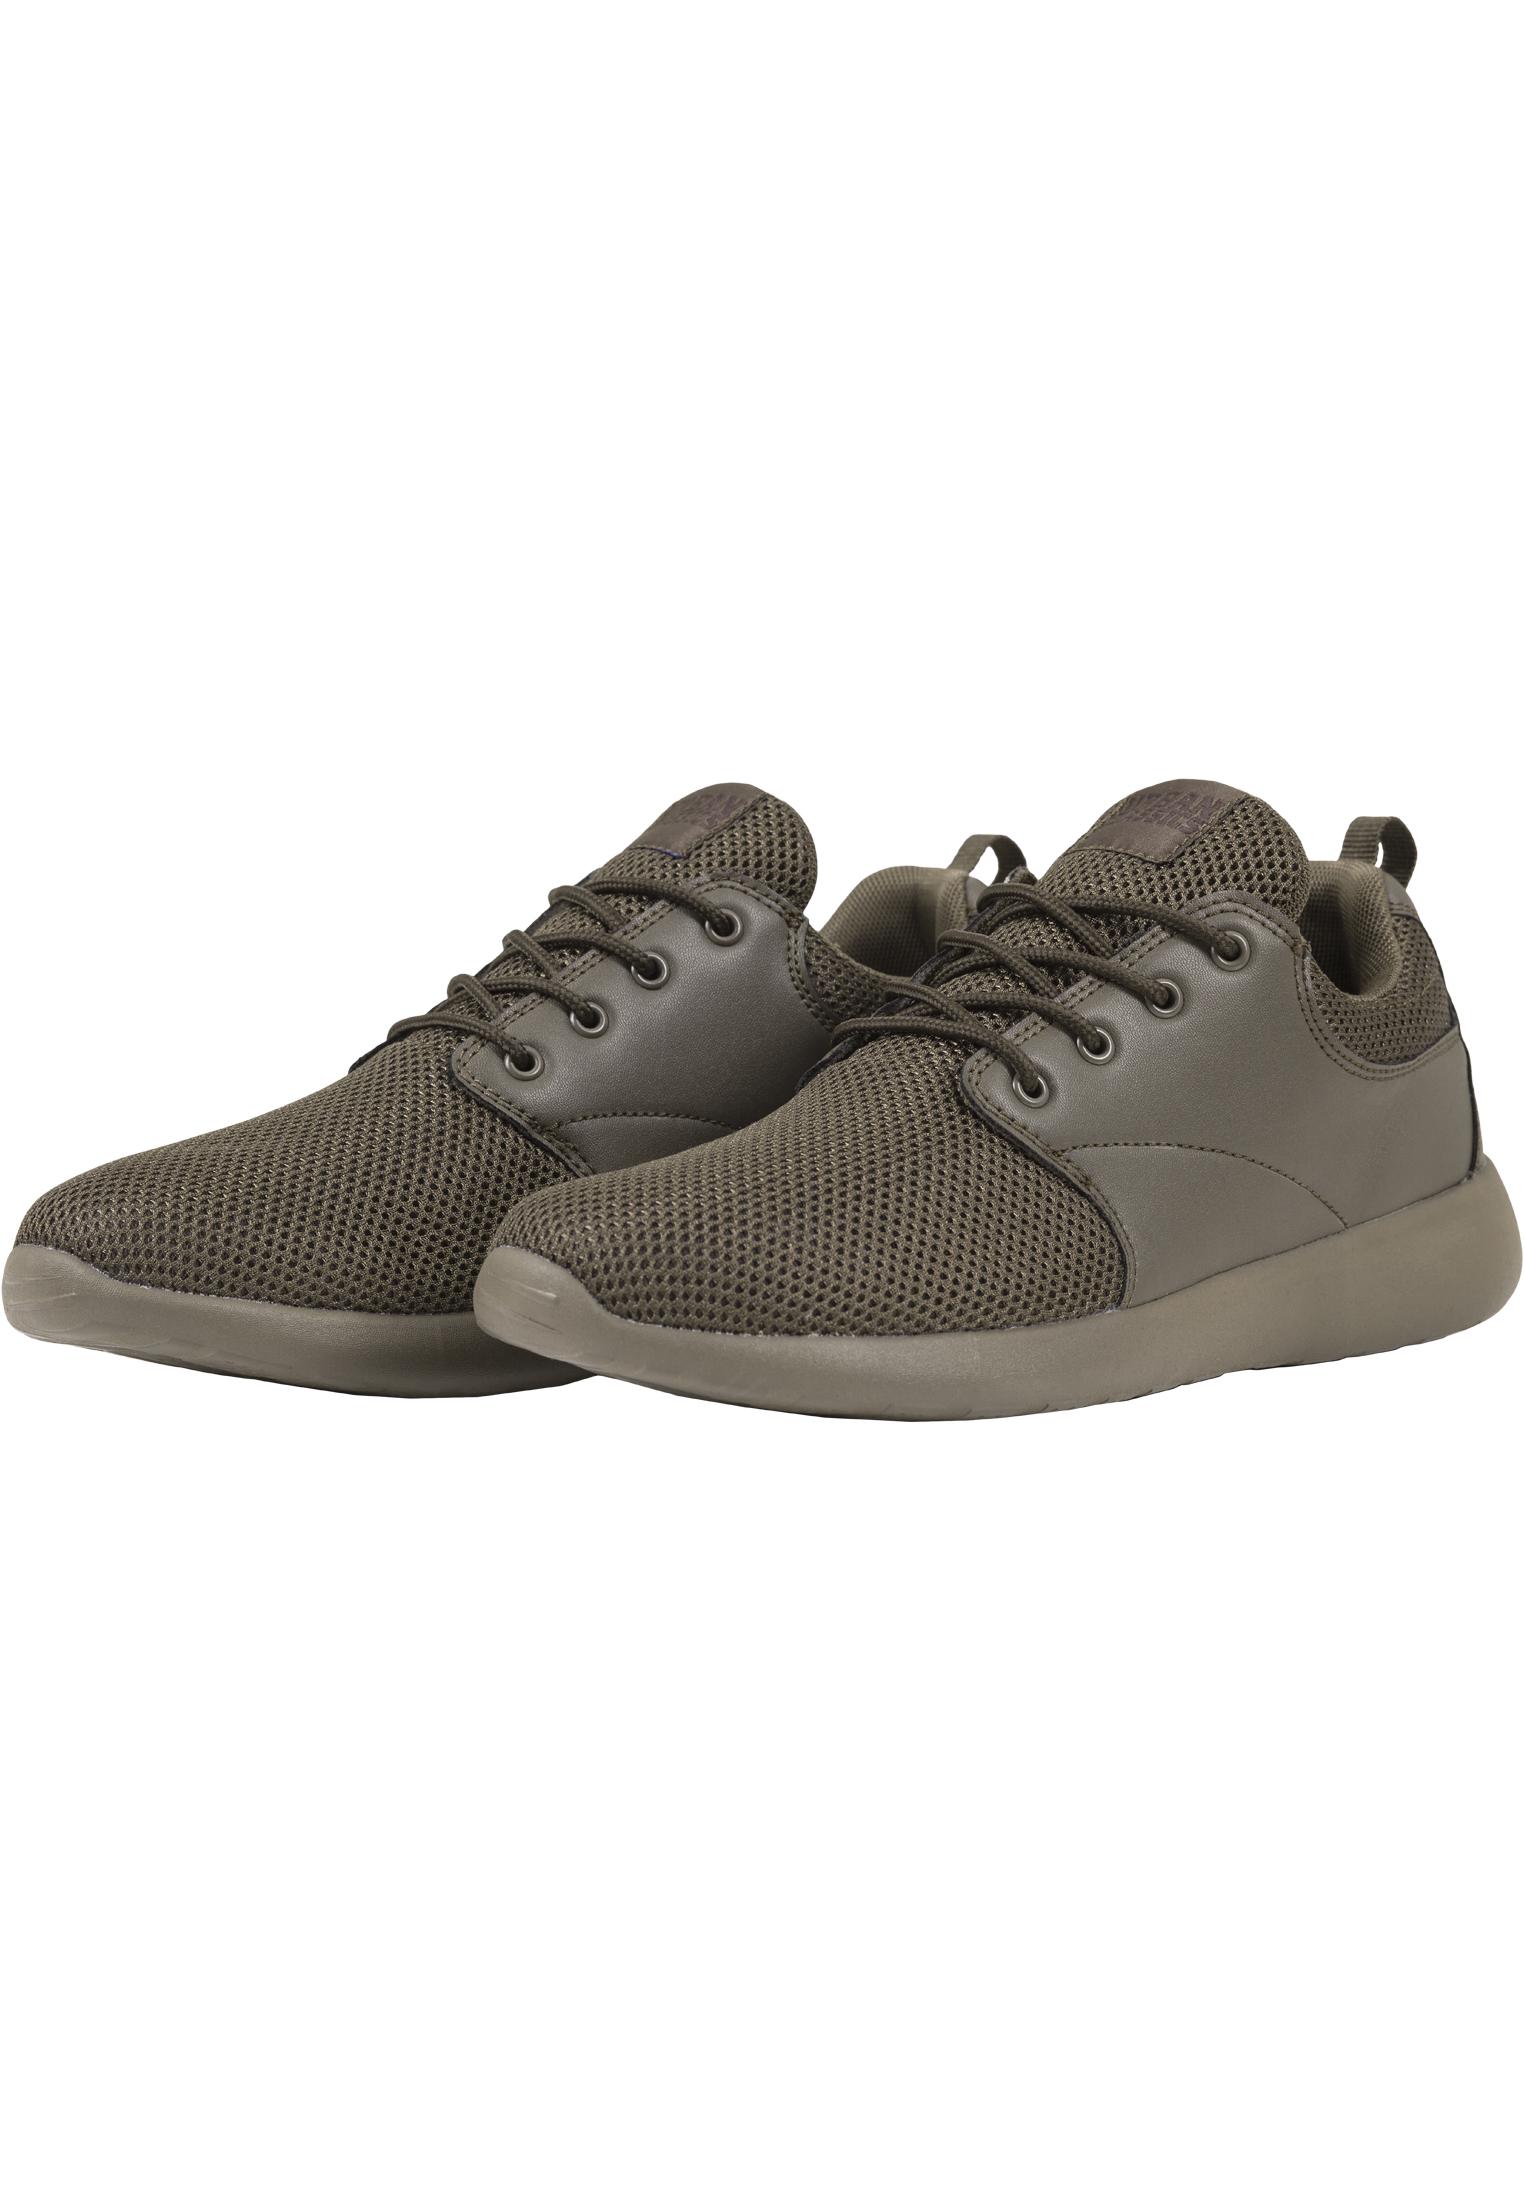 urban classics light runner shoe herren damen sommer schuh sneaker leicht luftig ebay. Black Bedroom Furniture Sets. Home Design Ideas